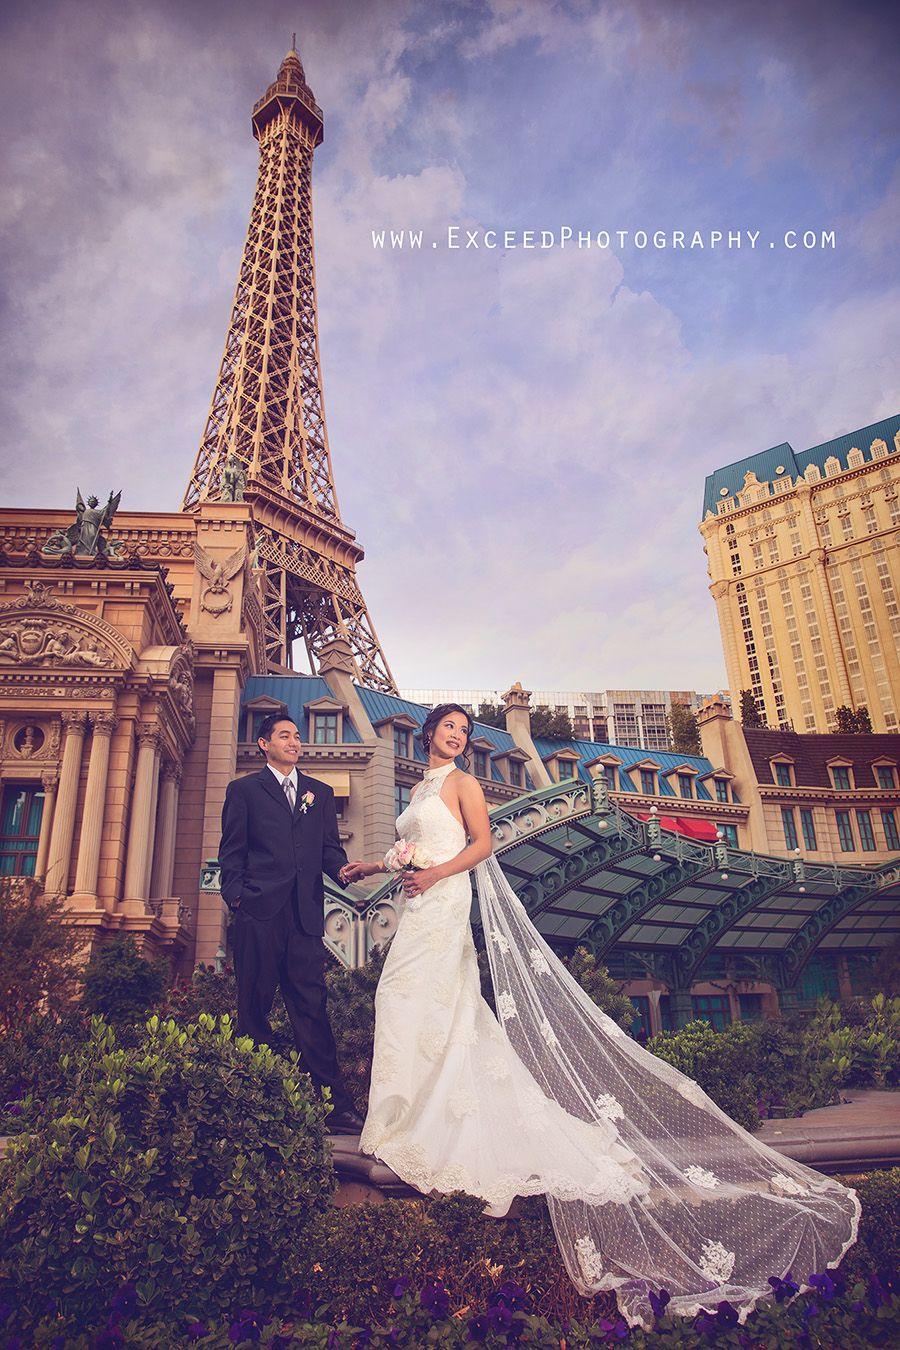 Wedding Anniversary Photo Shoot James And Jacqueline Las Vegas Event Photographer